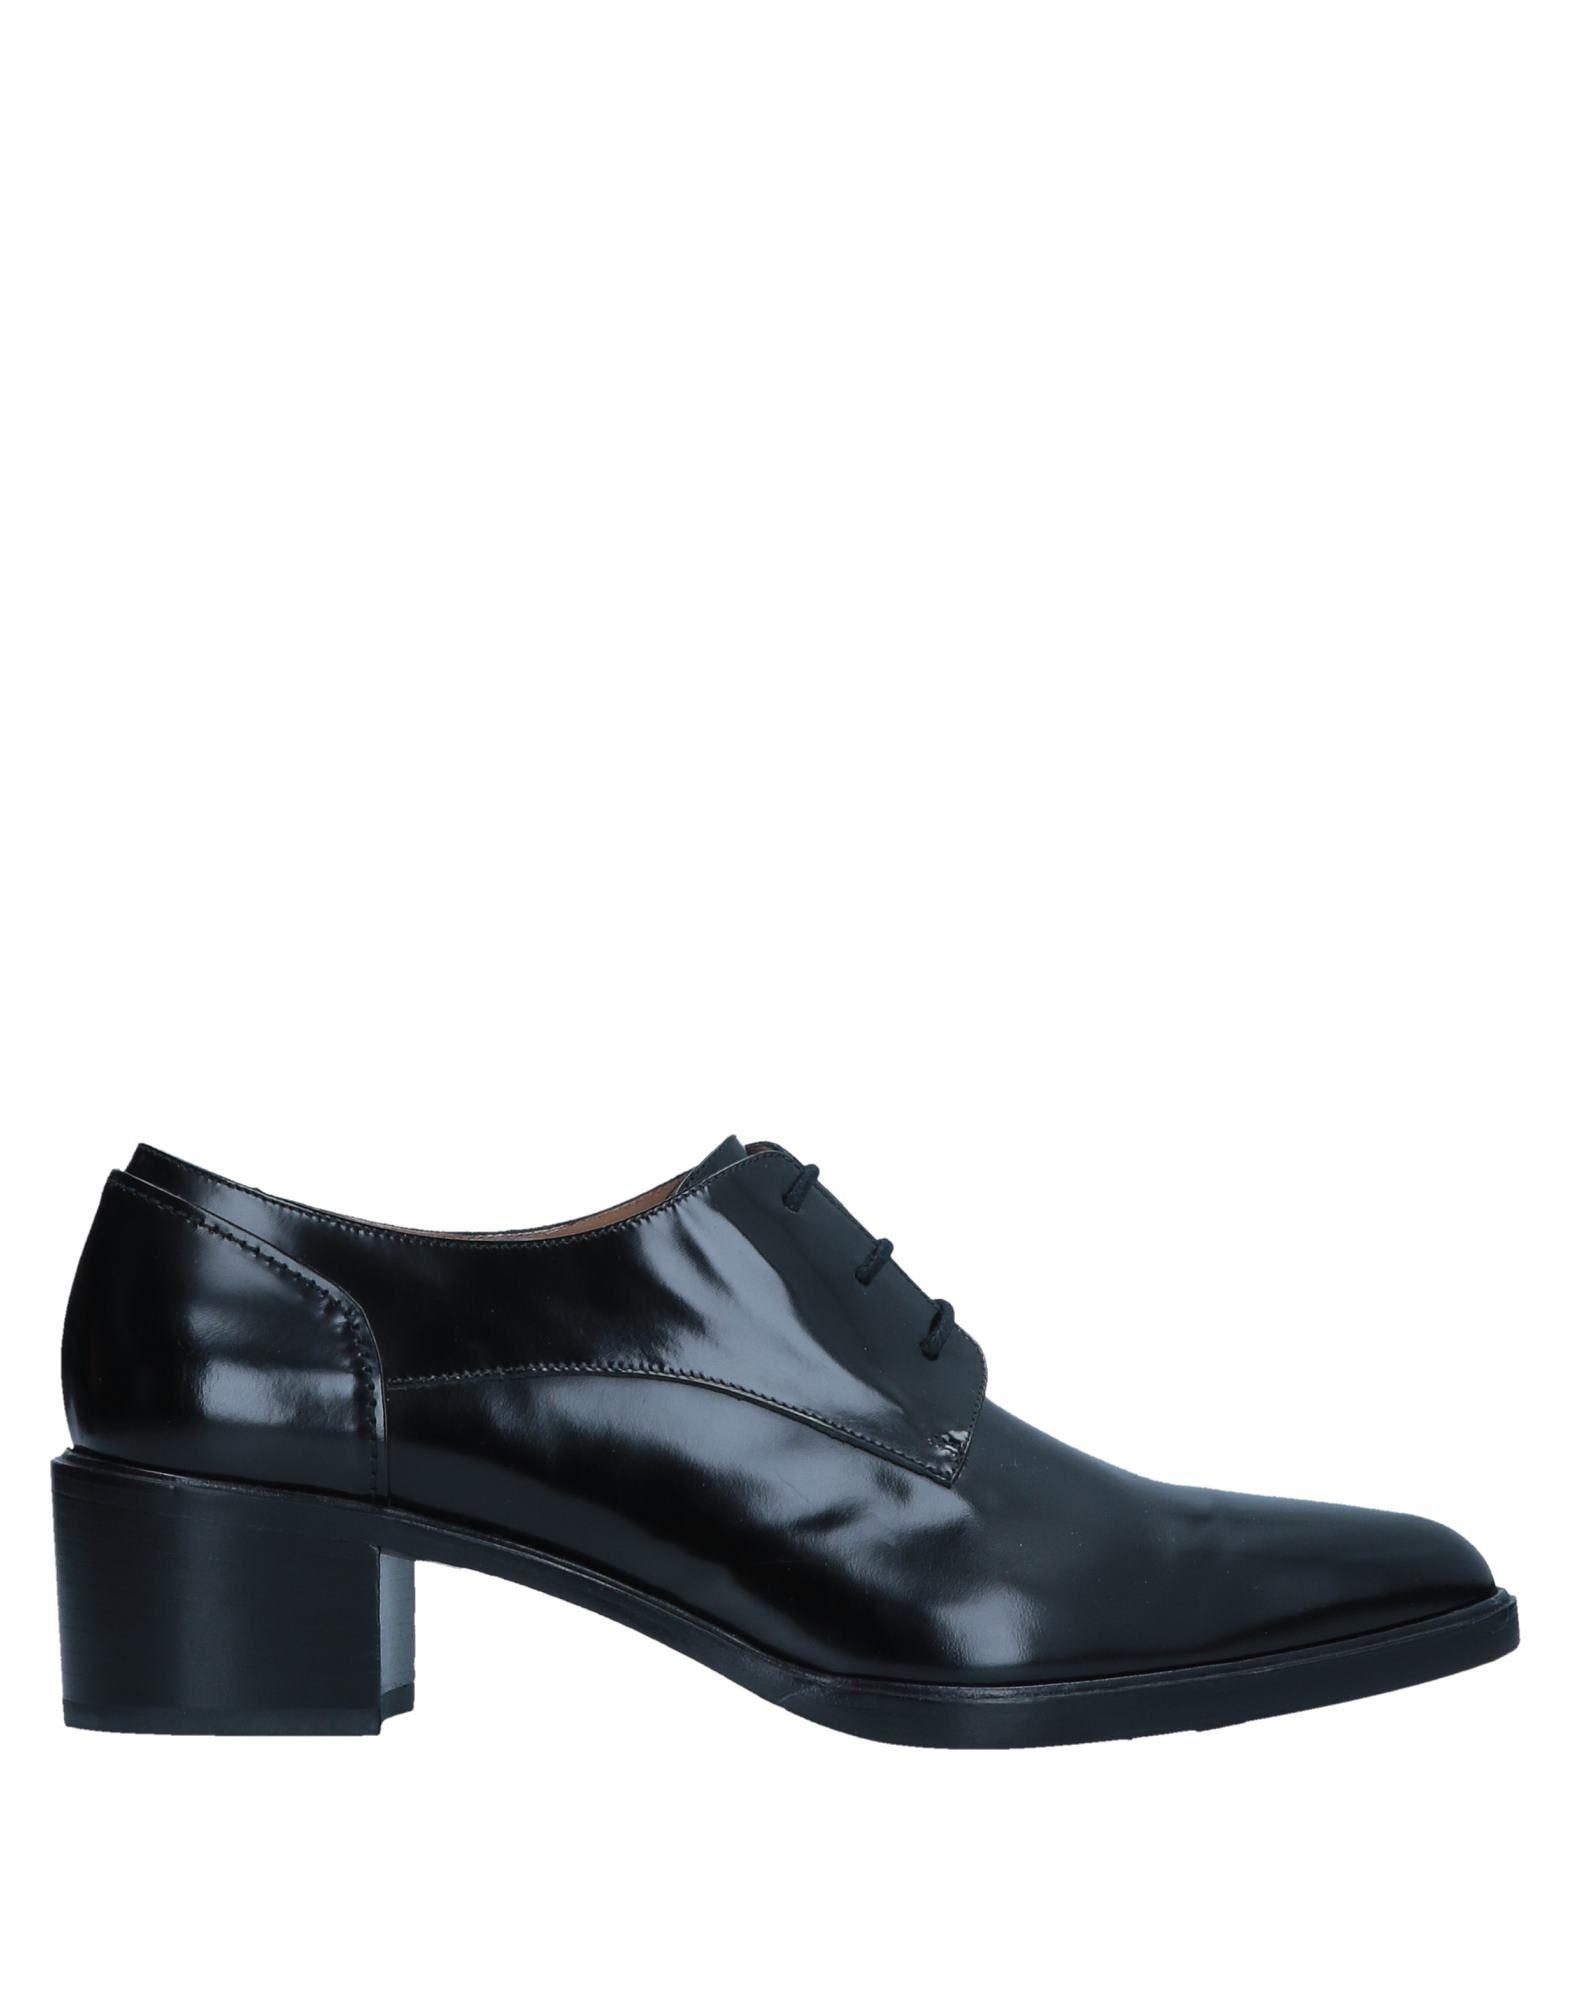 Rabatt Schuhe Fratelli Rossetti Schnürschuhe Damen  11550431EM